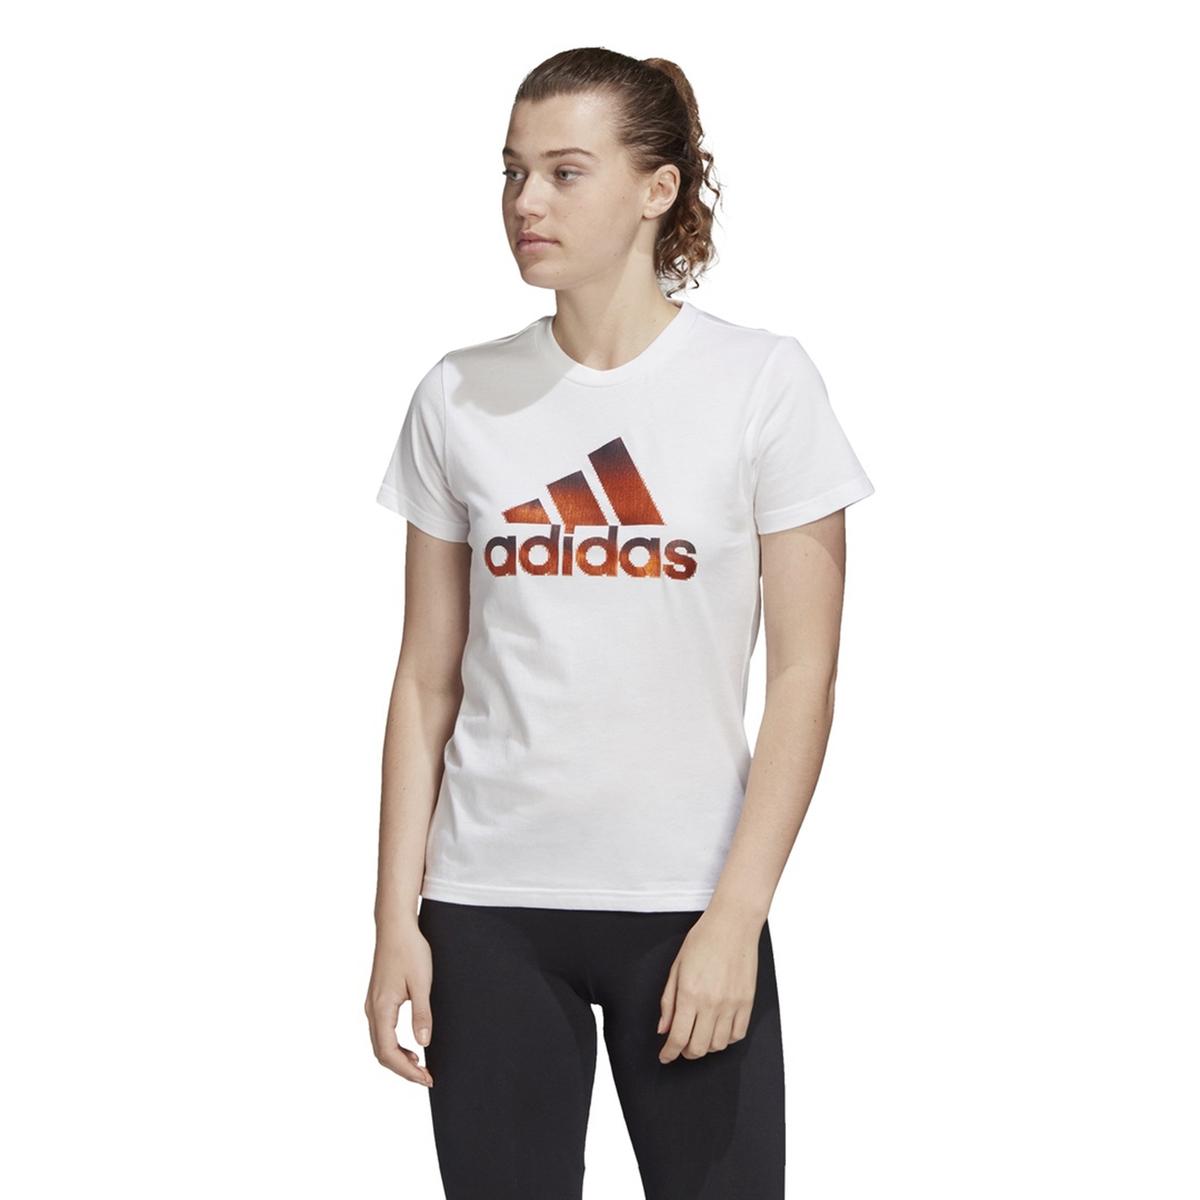 Camiseta deportiva, cuello redondo de manga corta